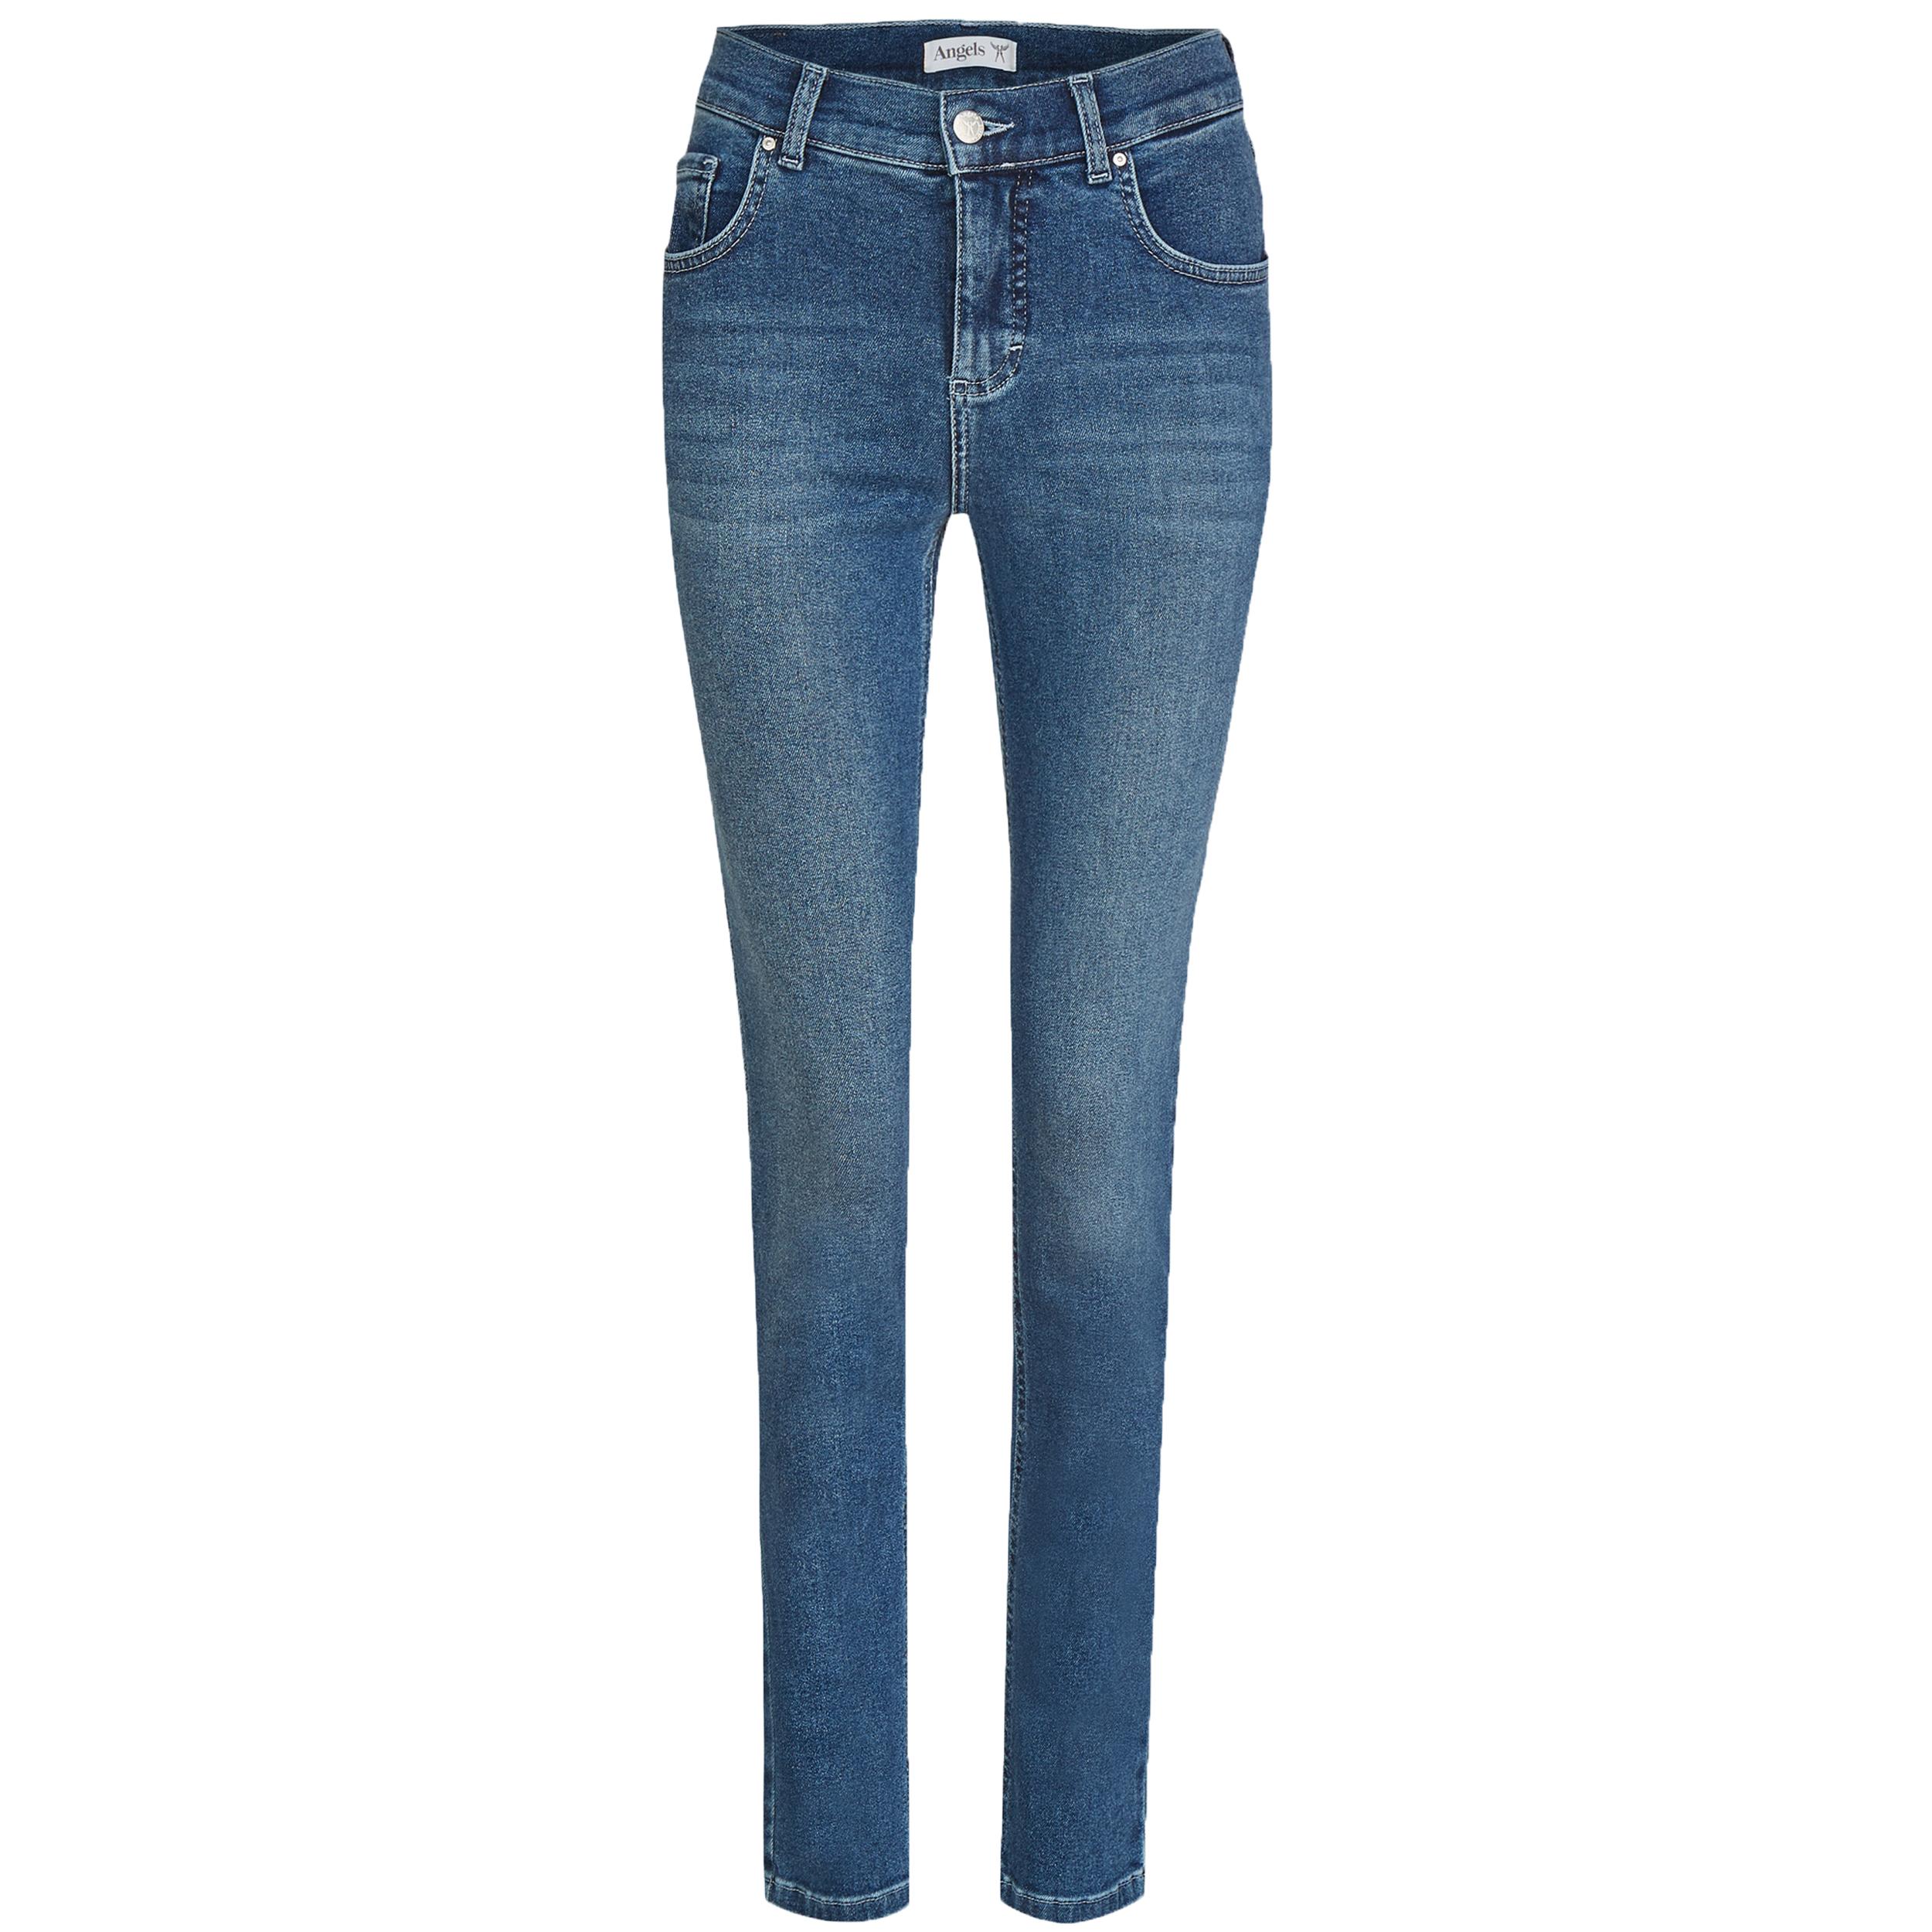 Angels Damen Jeans Skinny - mid blue 38/30